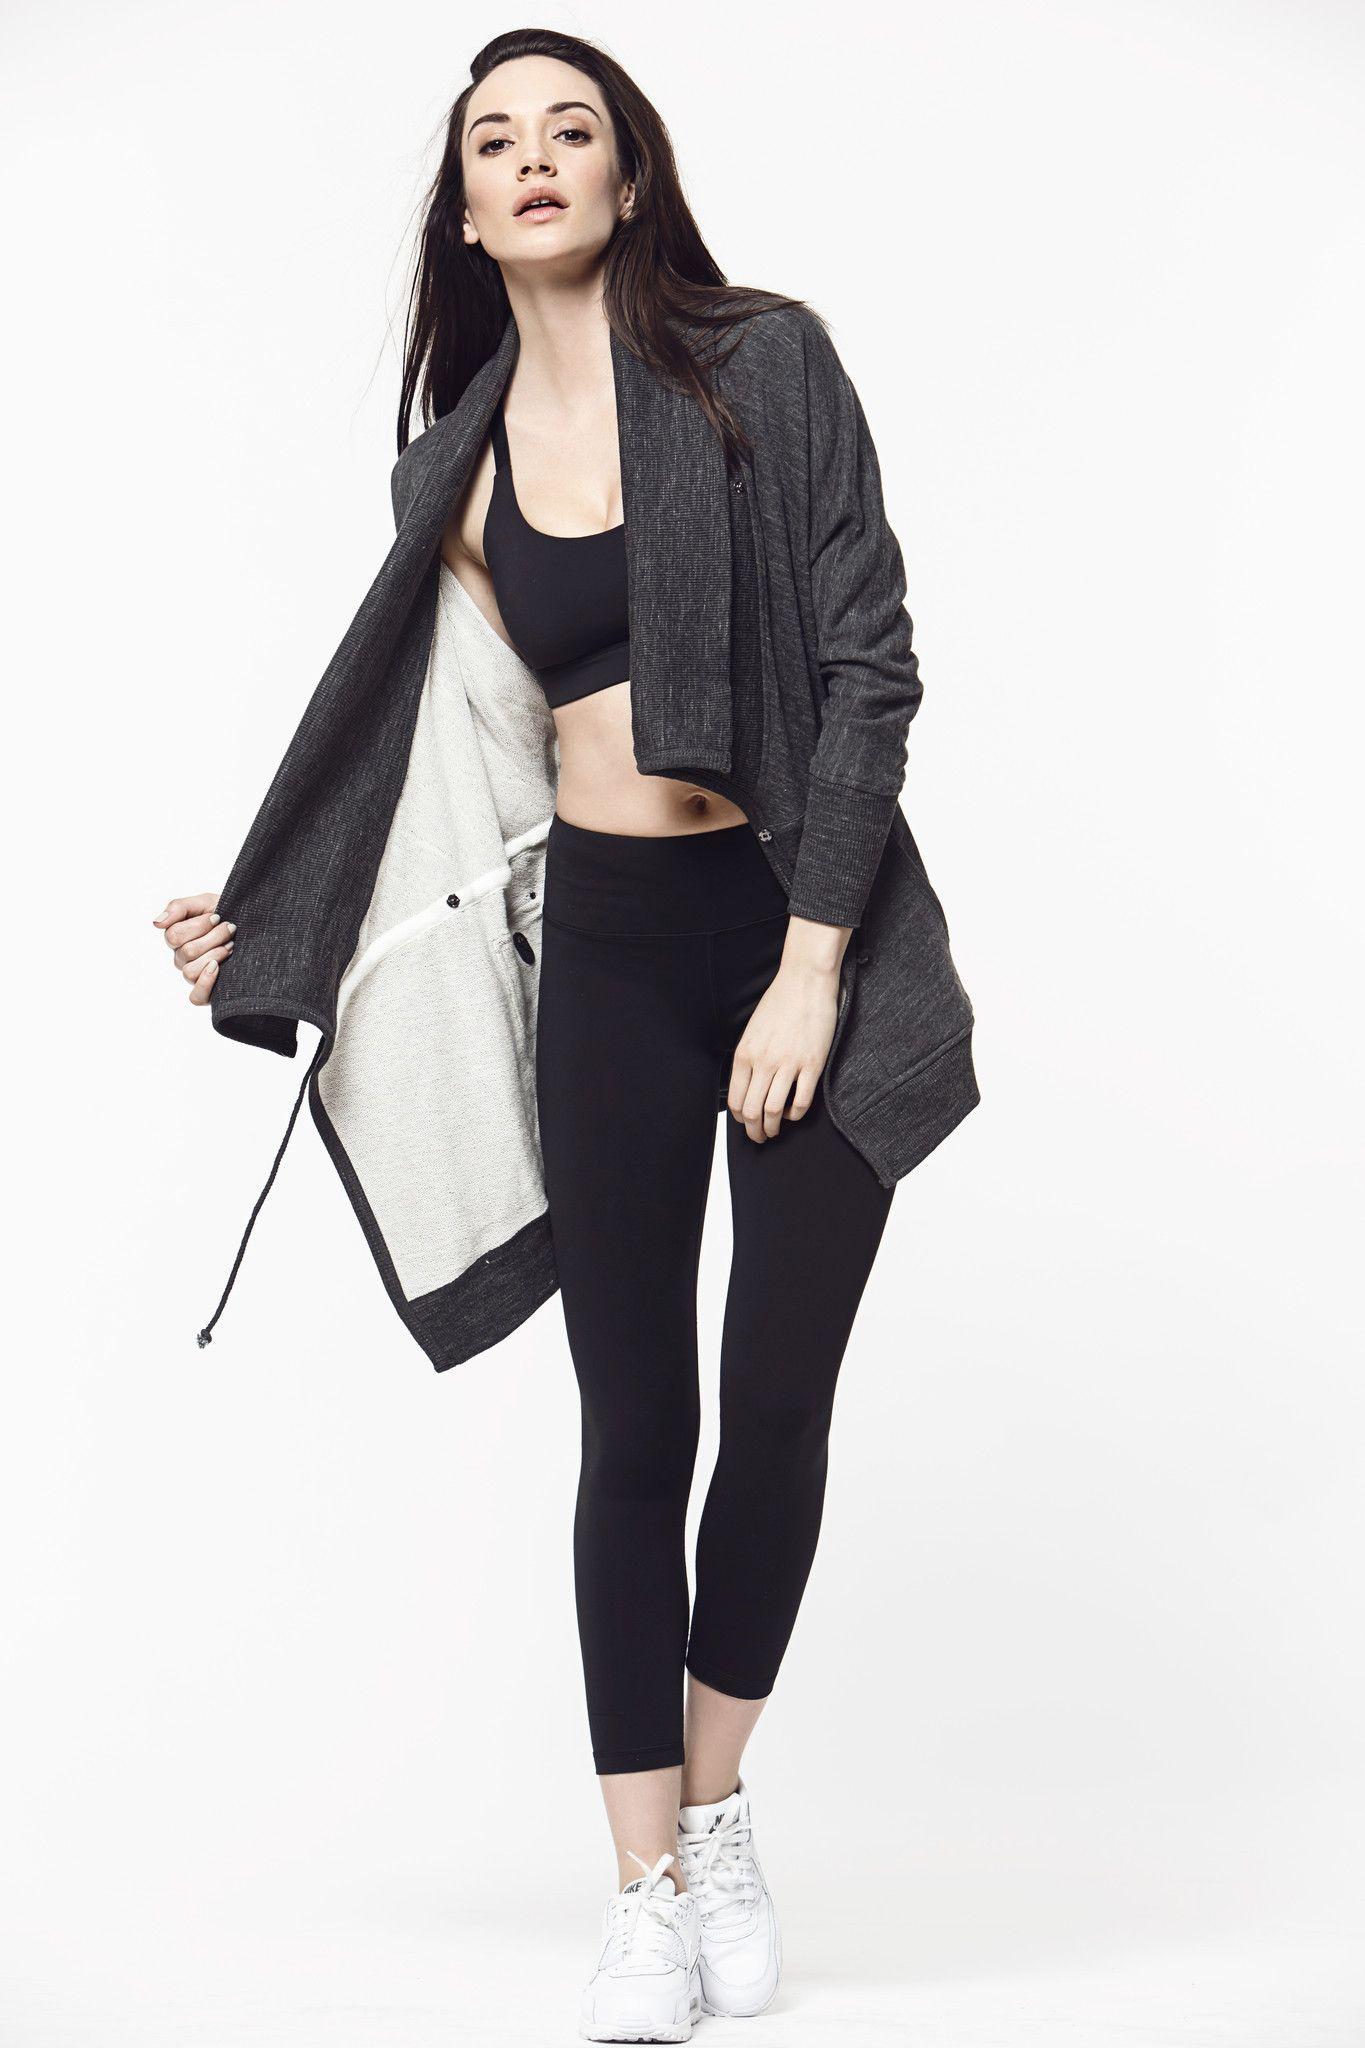 E-Cozy Sweater - Titika Active Couture™